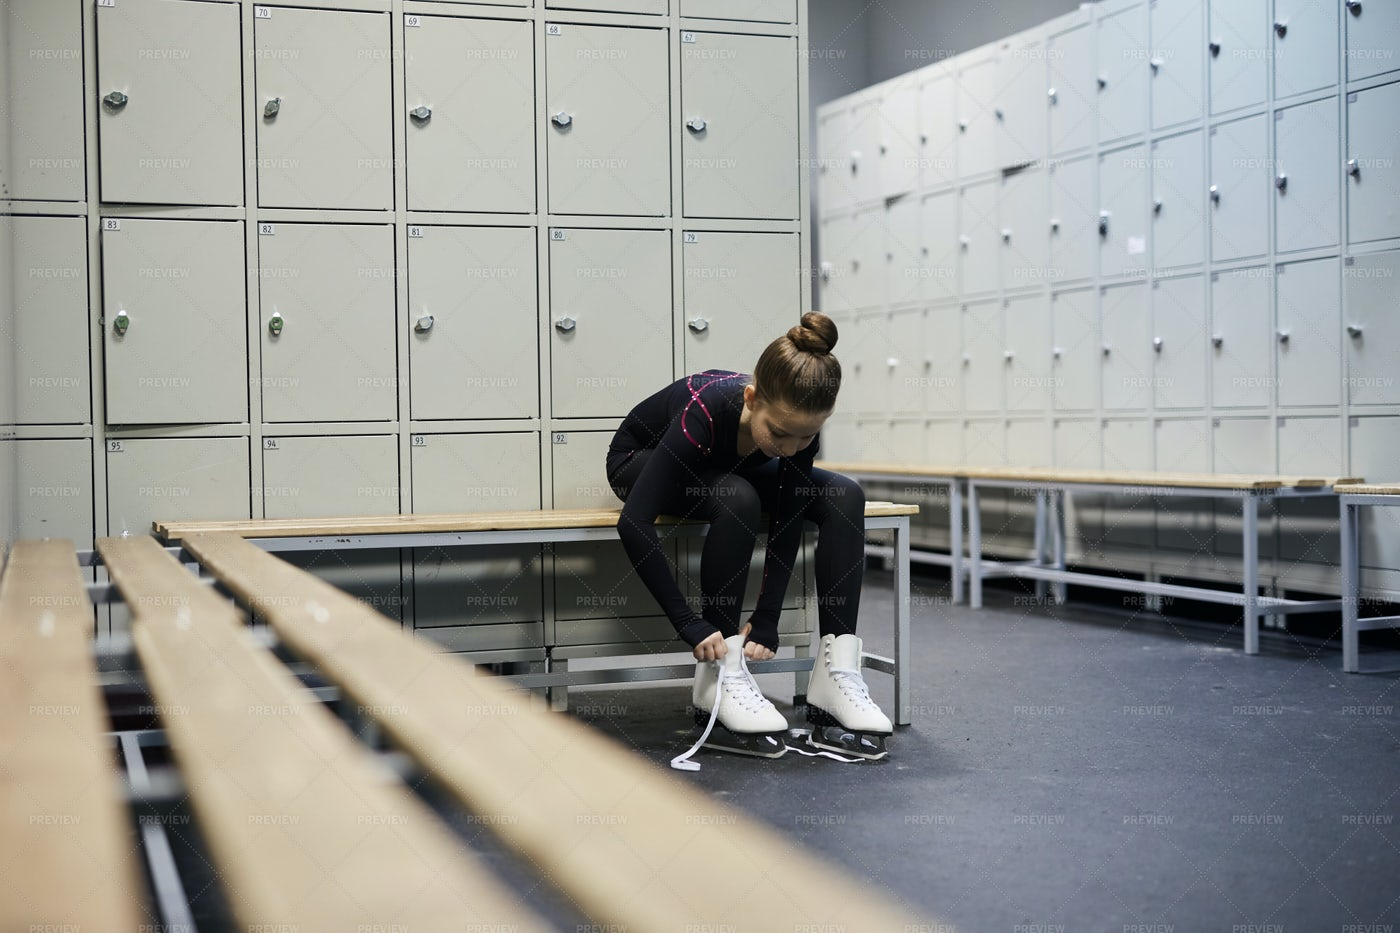 Girl Tying Skates In Dressing Room: Stock Photos